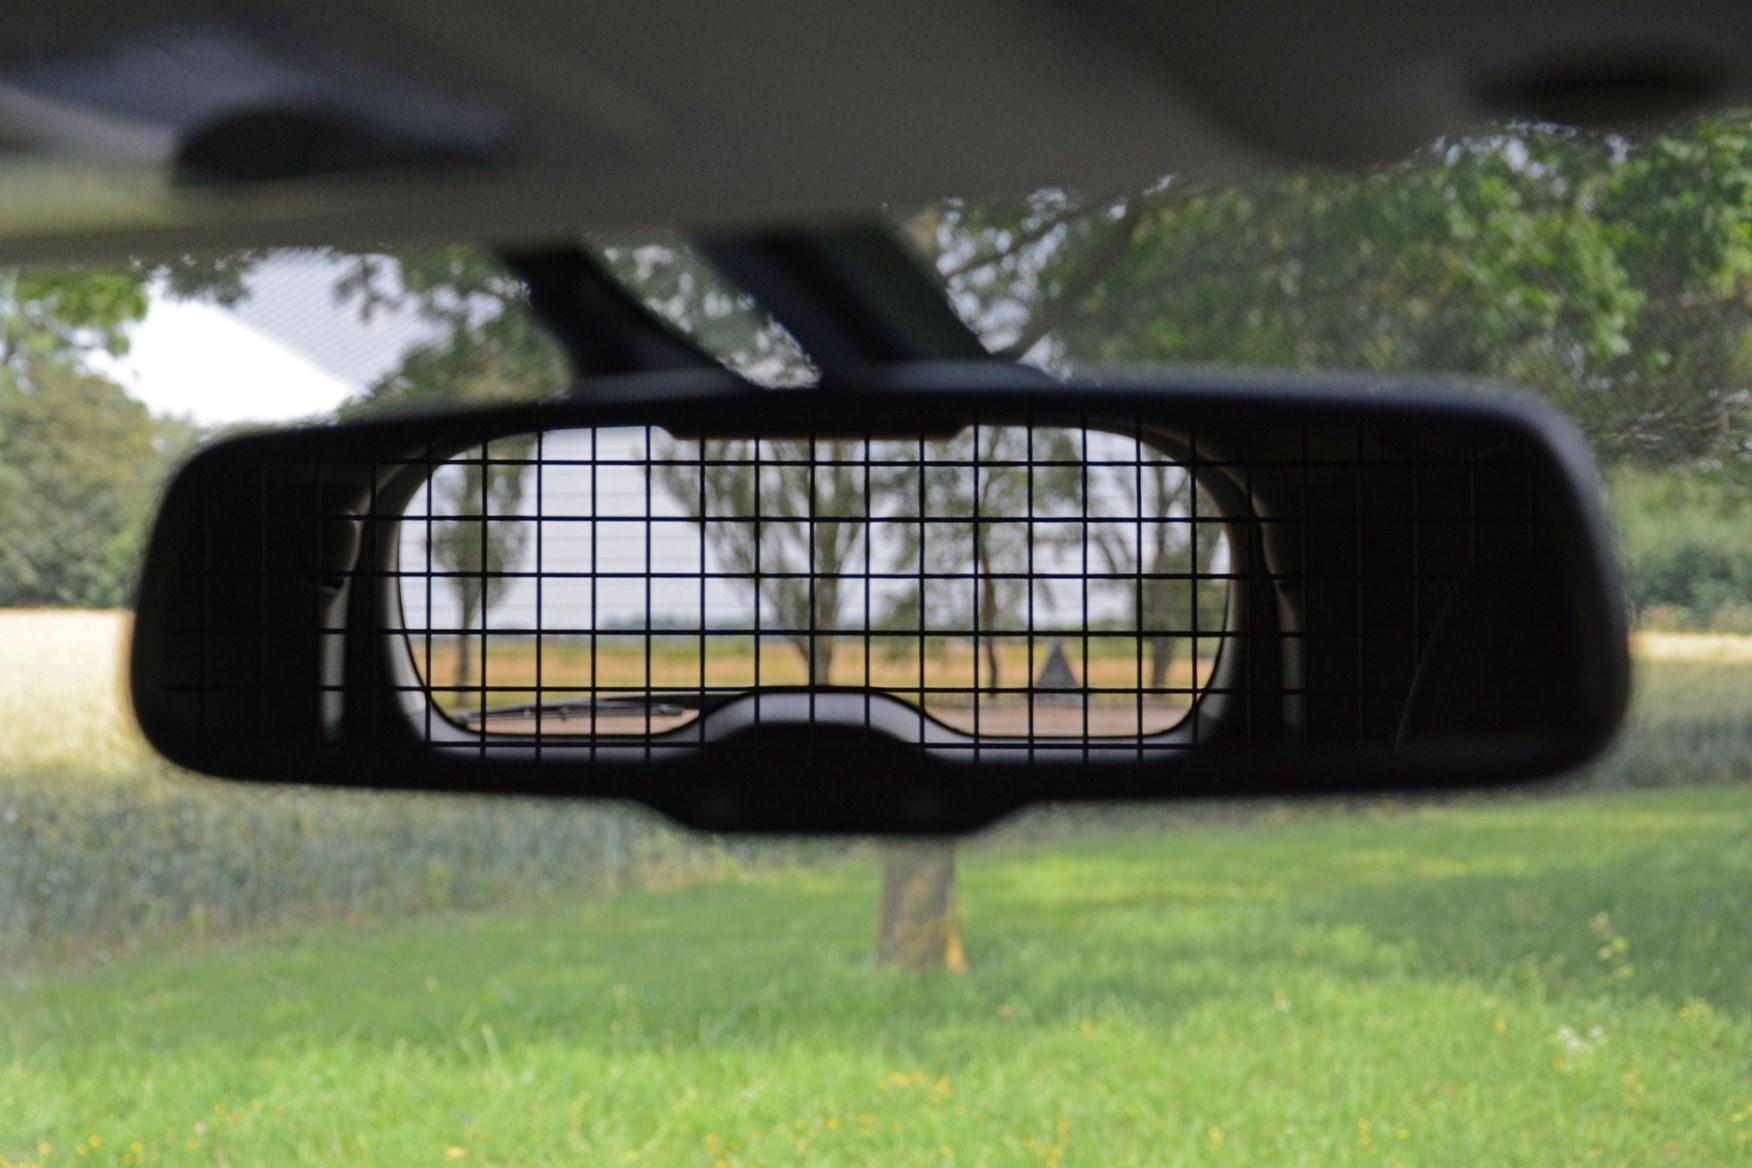 Mitsubishi Shogun Sport Commercial 4x4 van review - rear view in mirror through bulkhead mesh